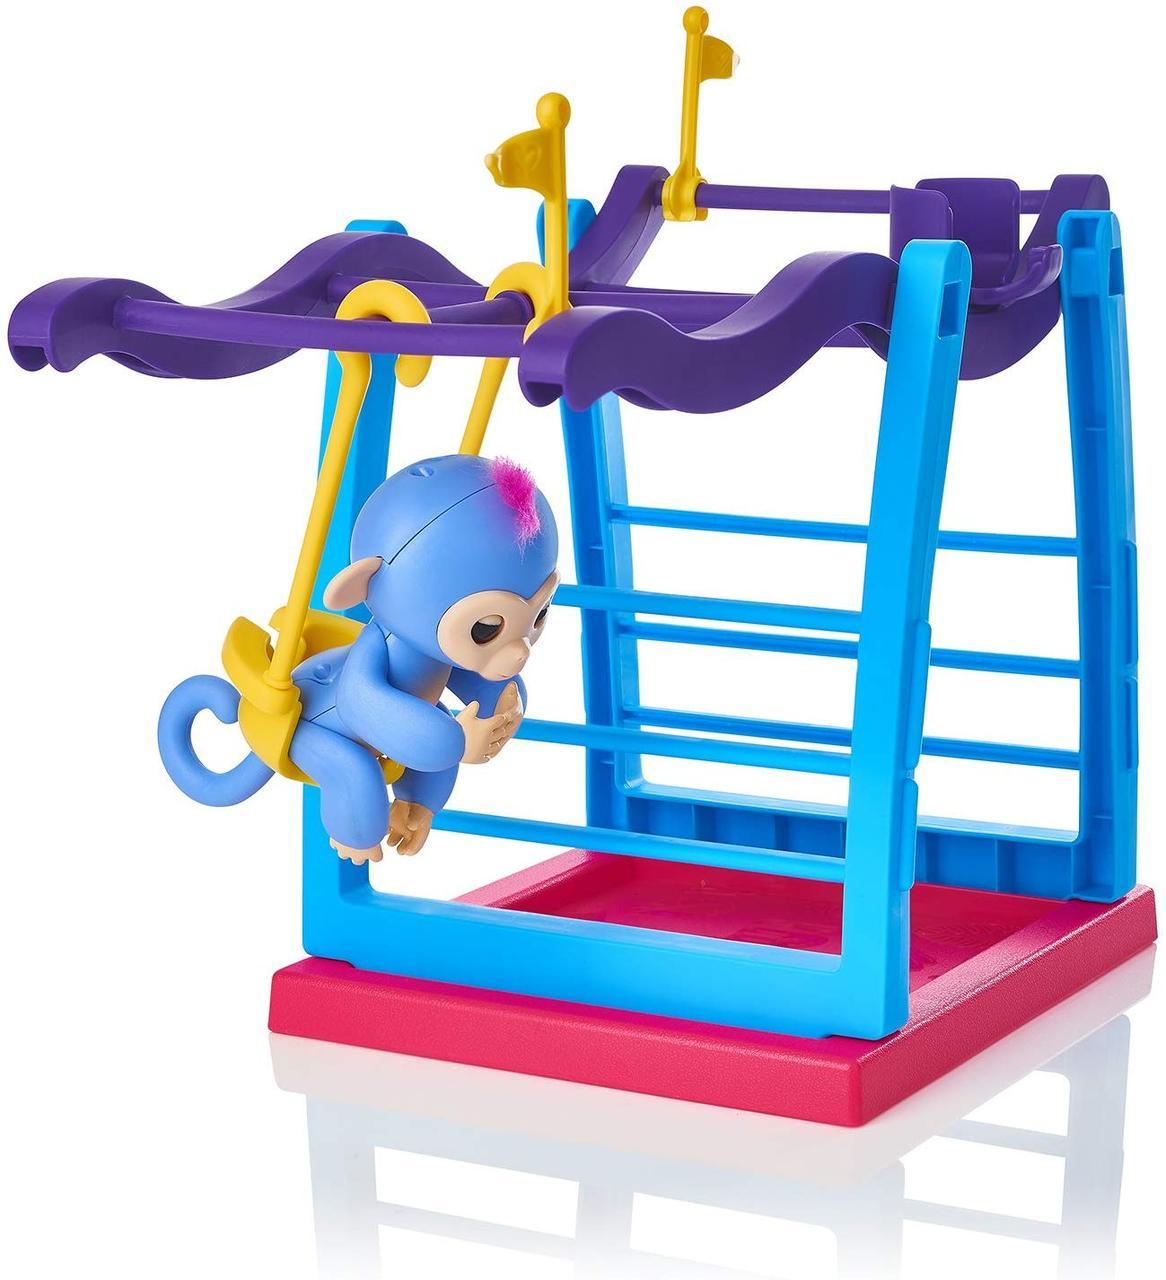 Интерактивная обезьянка с детской площадкой  WowWee Fingerlings Playset - Monkey Bar Playground